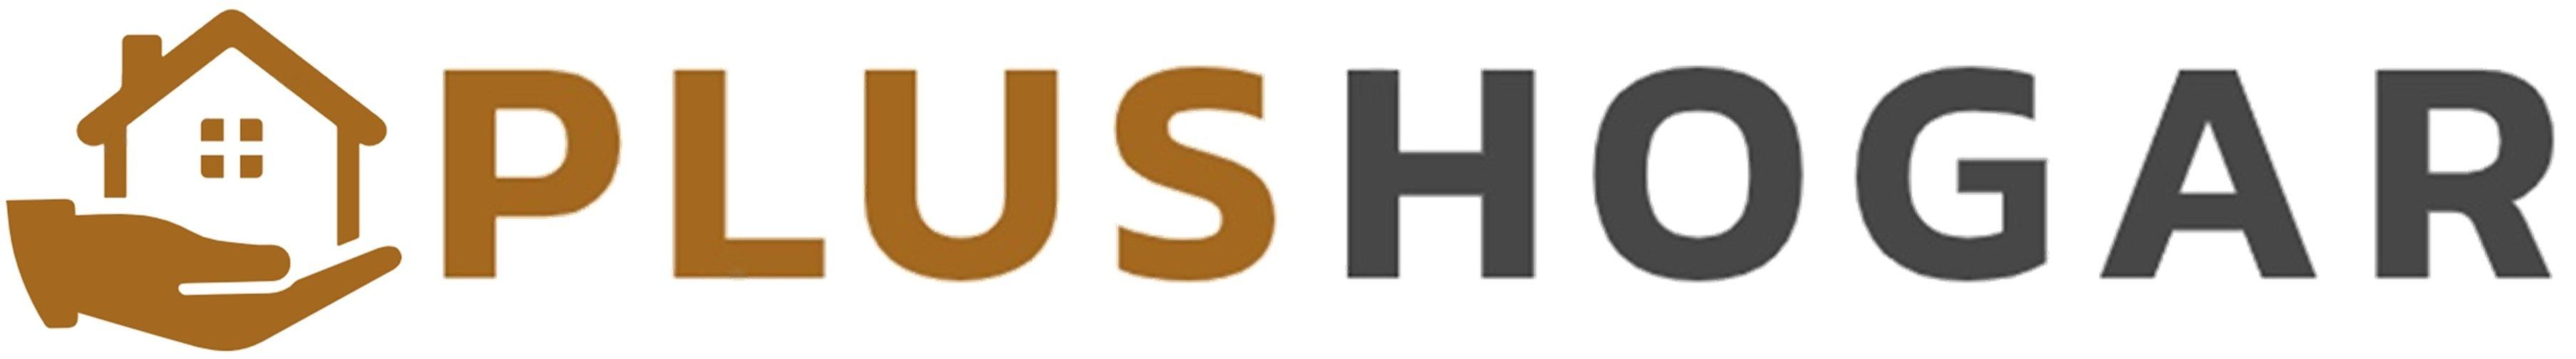 Inmobiliaria PlusHogar